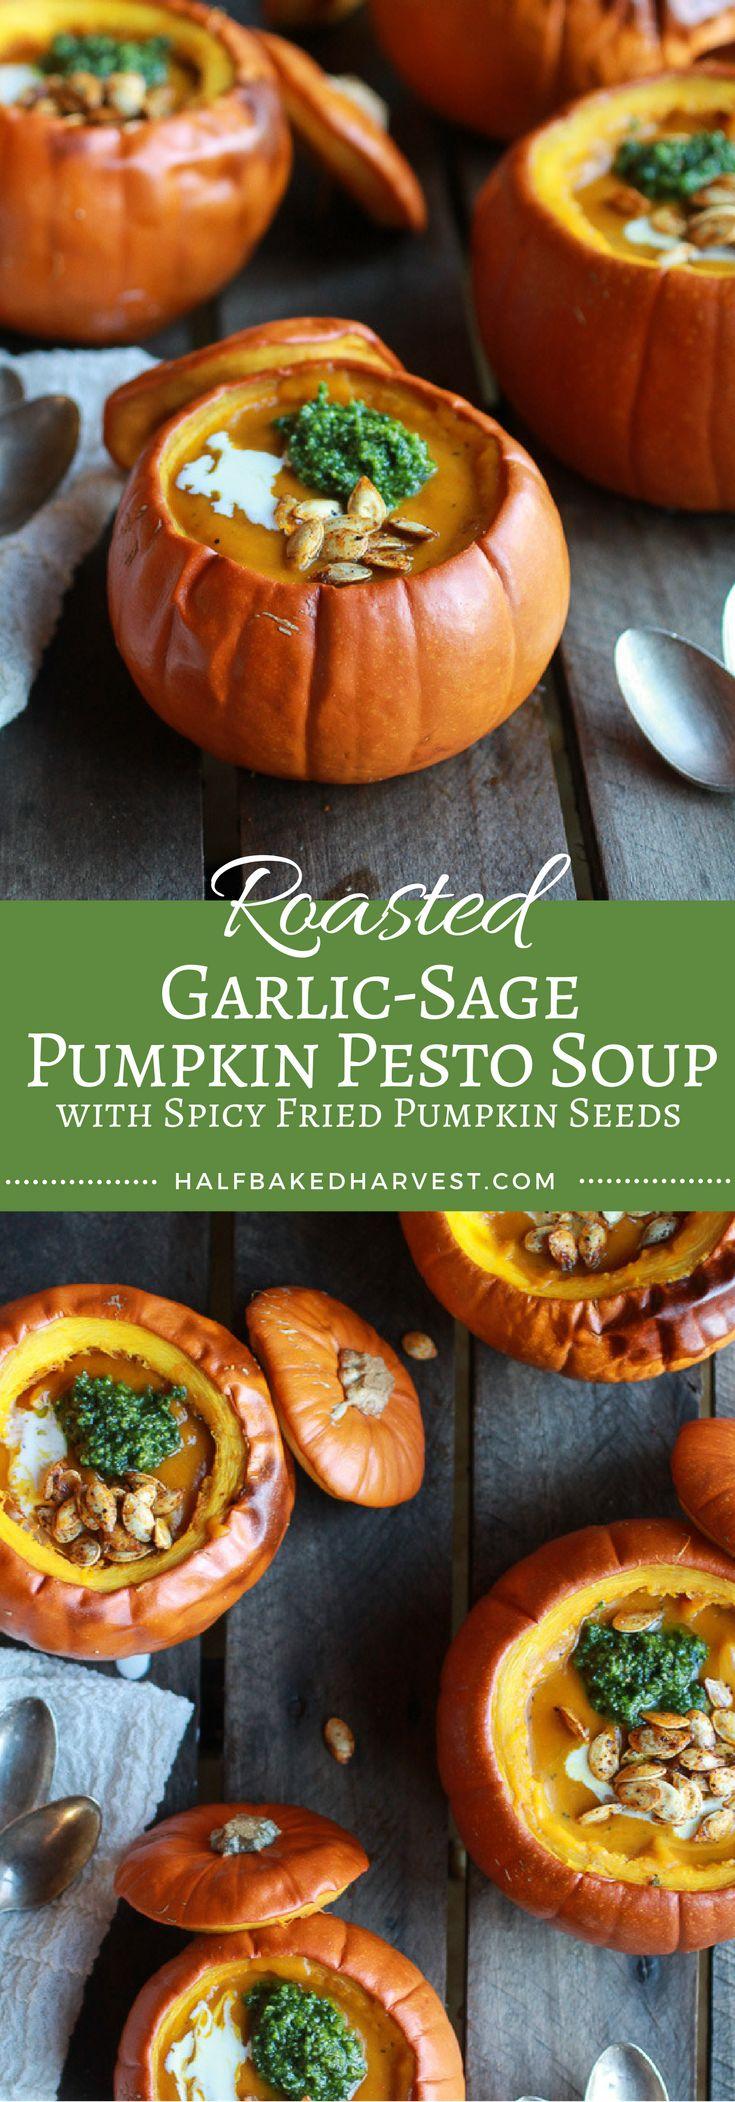 Roasted Garlic-Sage Pumpkin Pesto Soup with Spicy Fried Pumpkin Seeds | www.halfbakedharvest.com @hbharvest